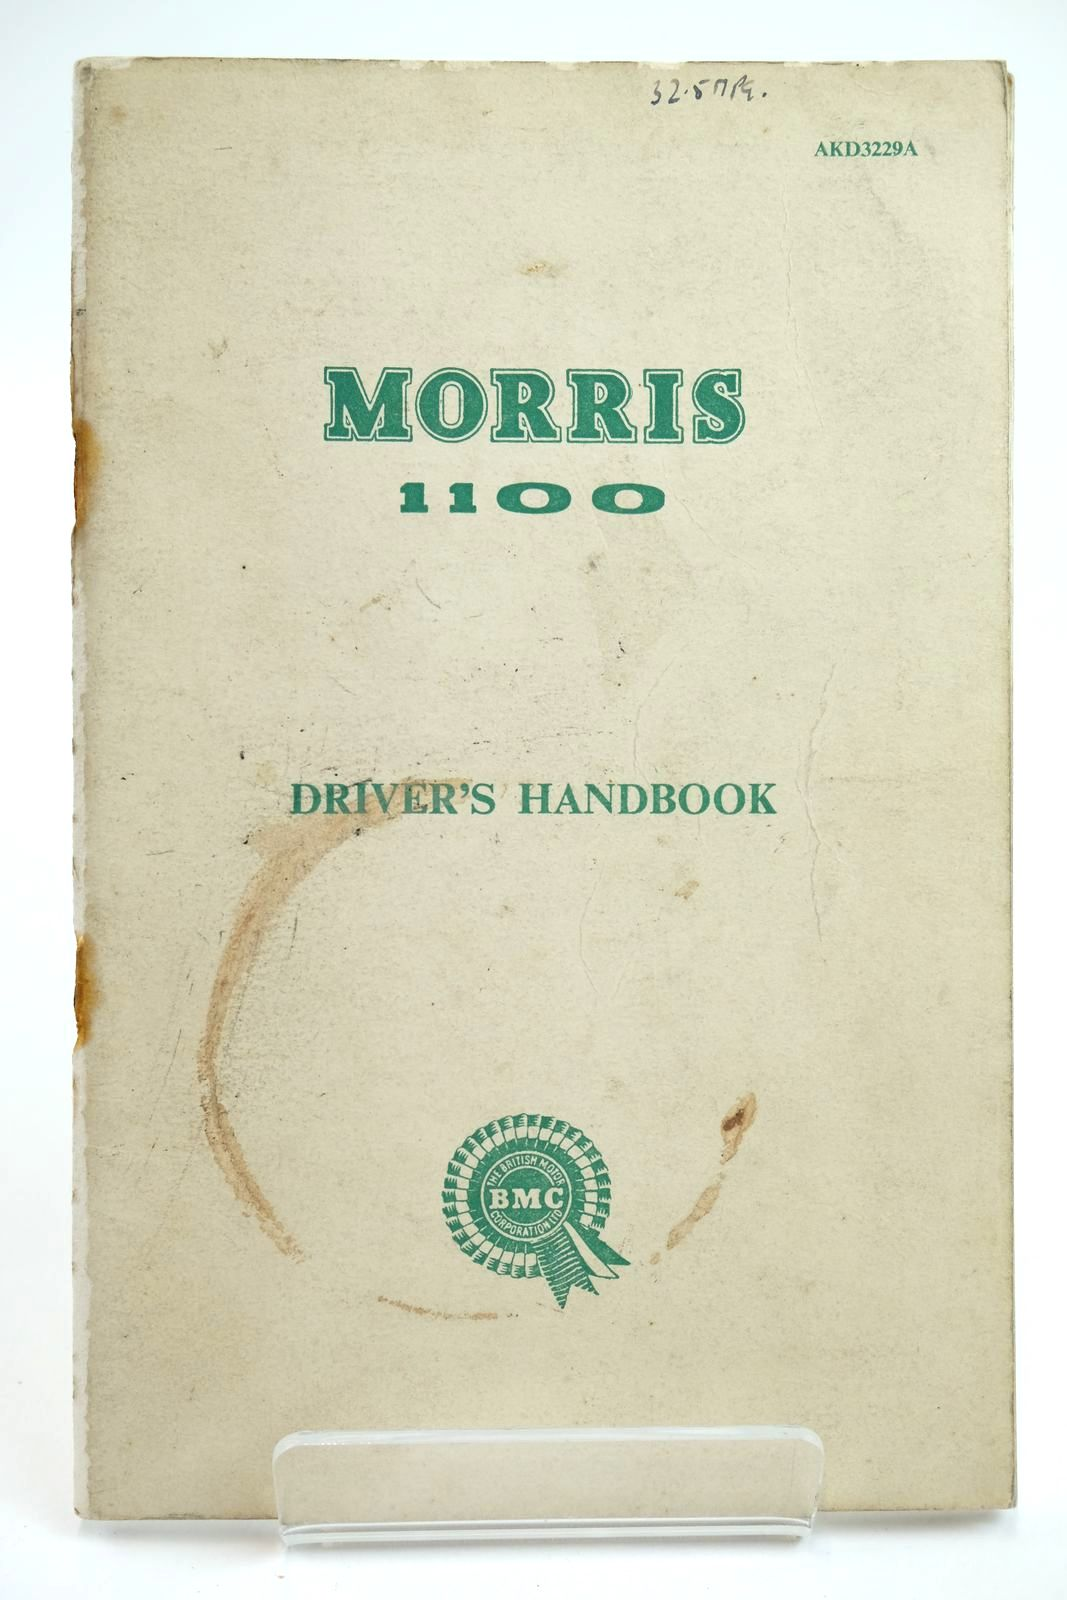 Photo of MORRIS 1100 DRIVER'S HANDBOOK- Stock Number: 2132240